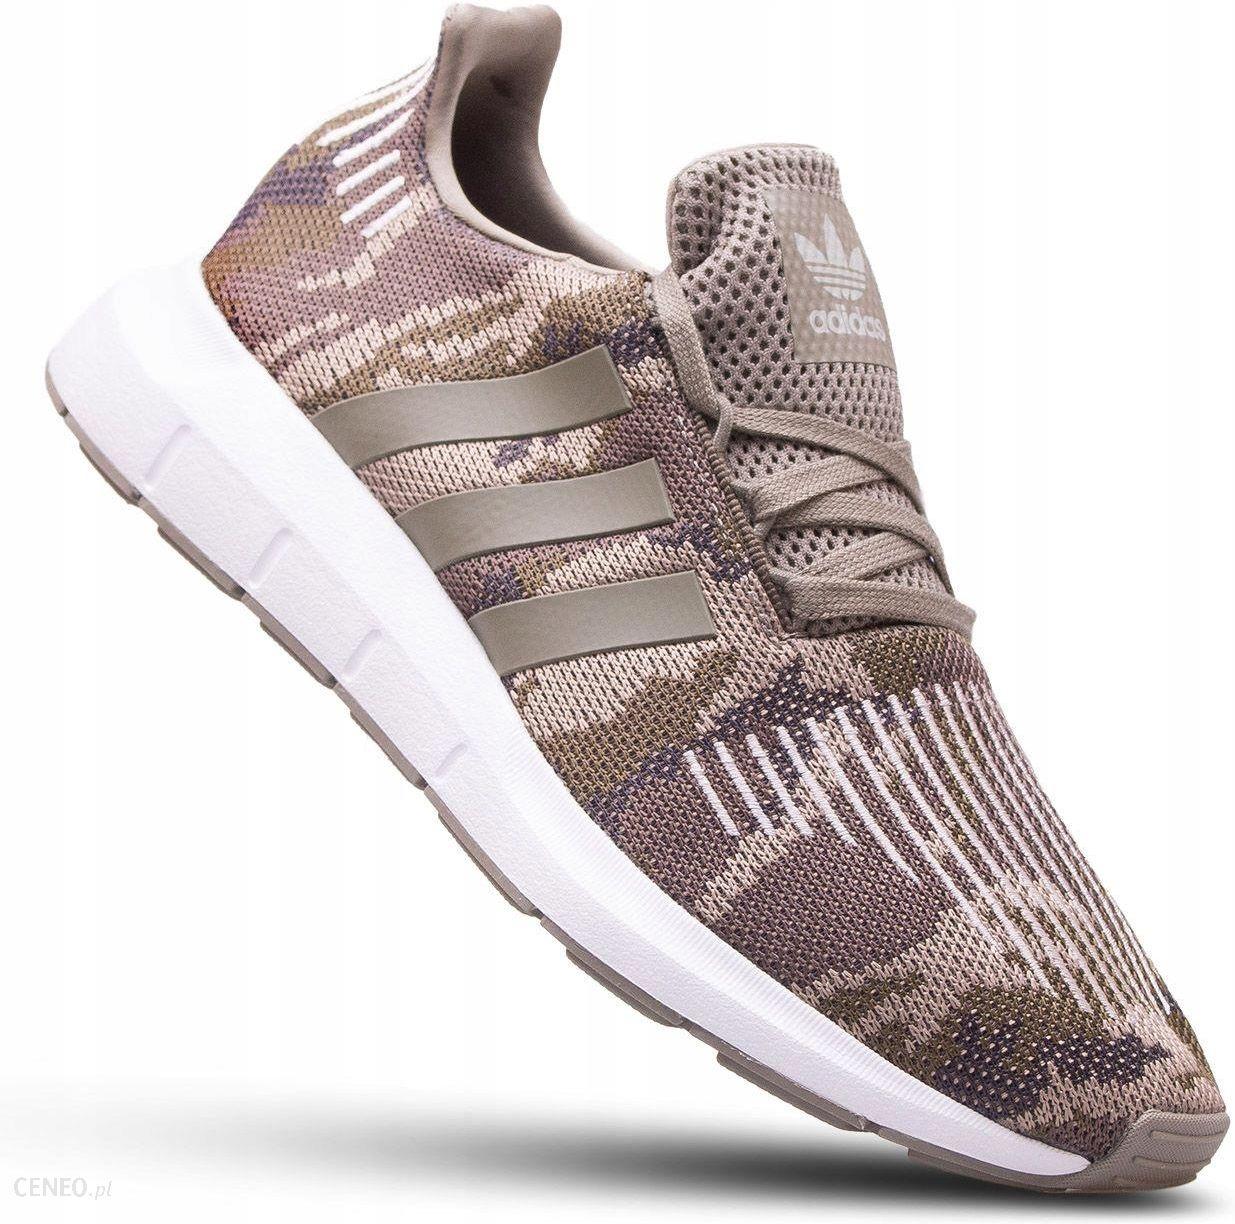 Adidas Originals Swift Run Sneakers Szary 41 13 Ceny i opinie Ceneo.pl